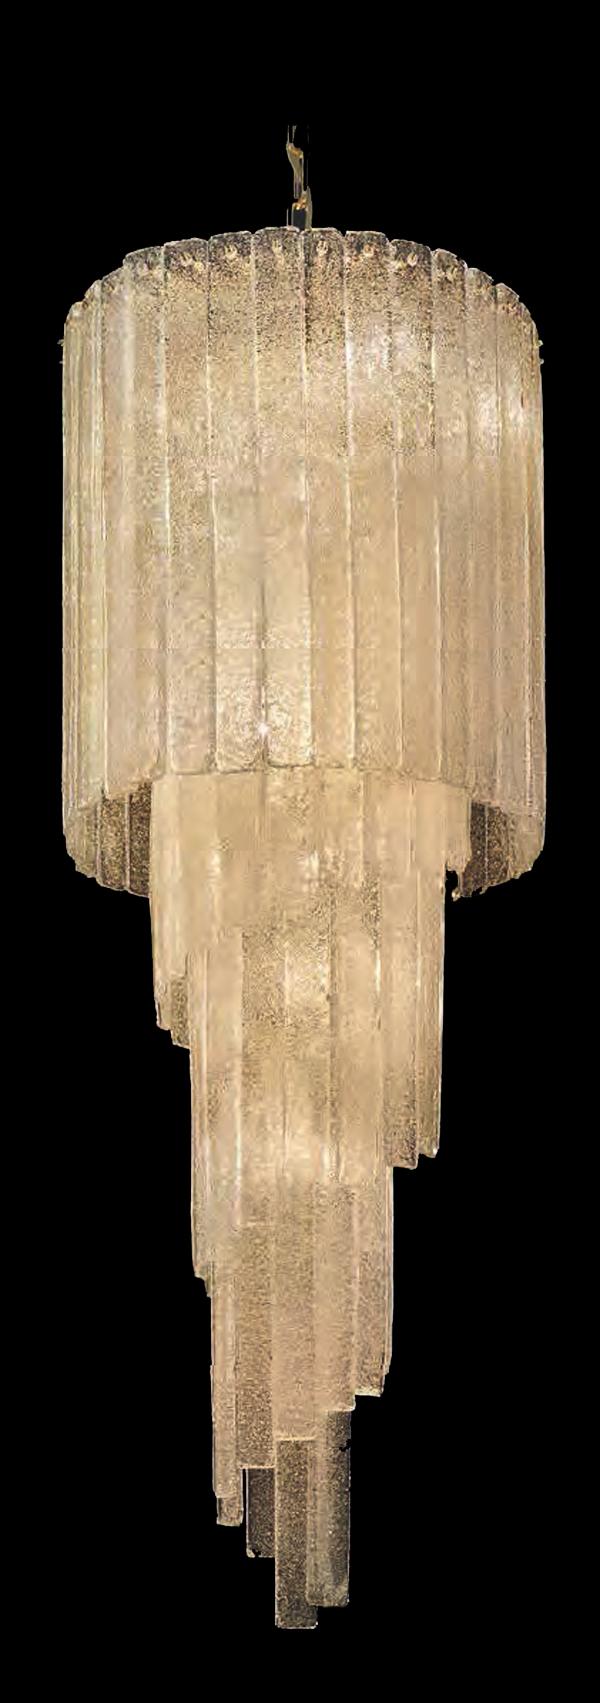 Italian Chandelier Modern Lighting industrial vintage pendants – Italian Glass Chandeliers